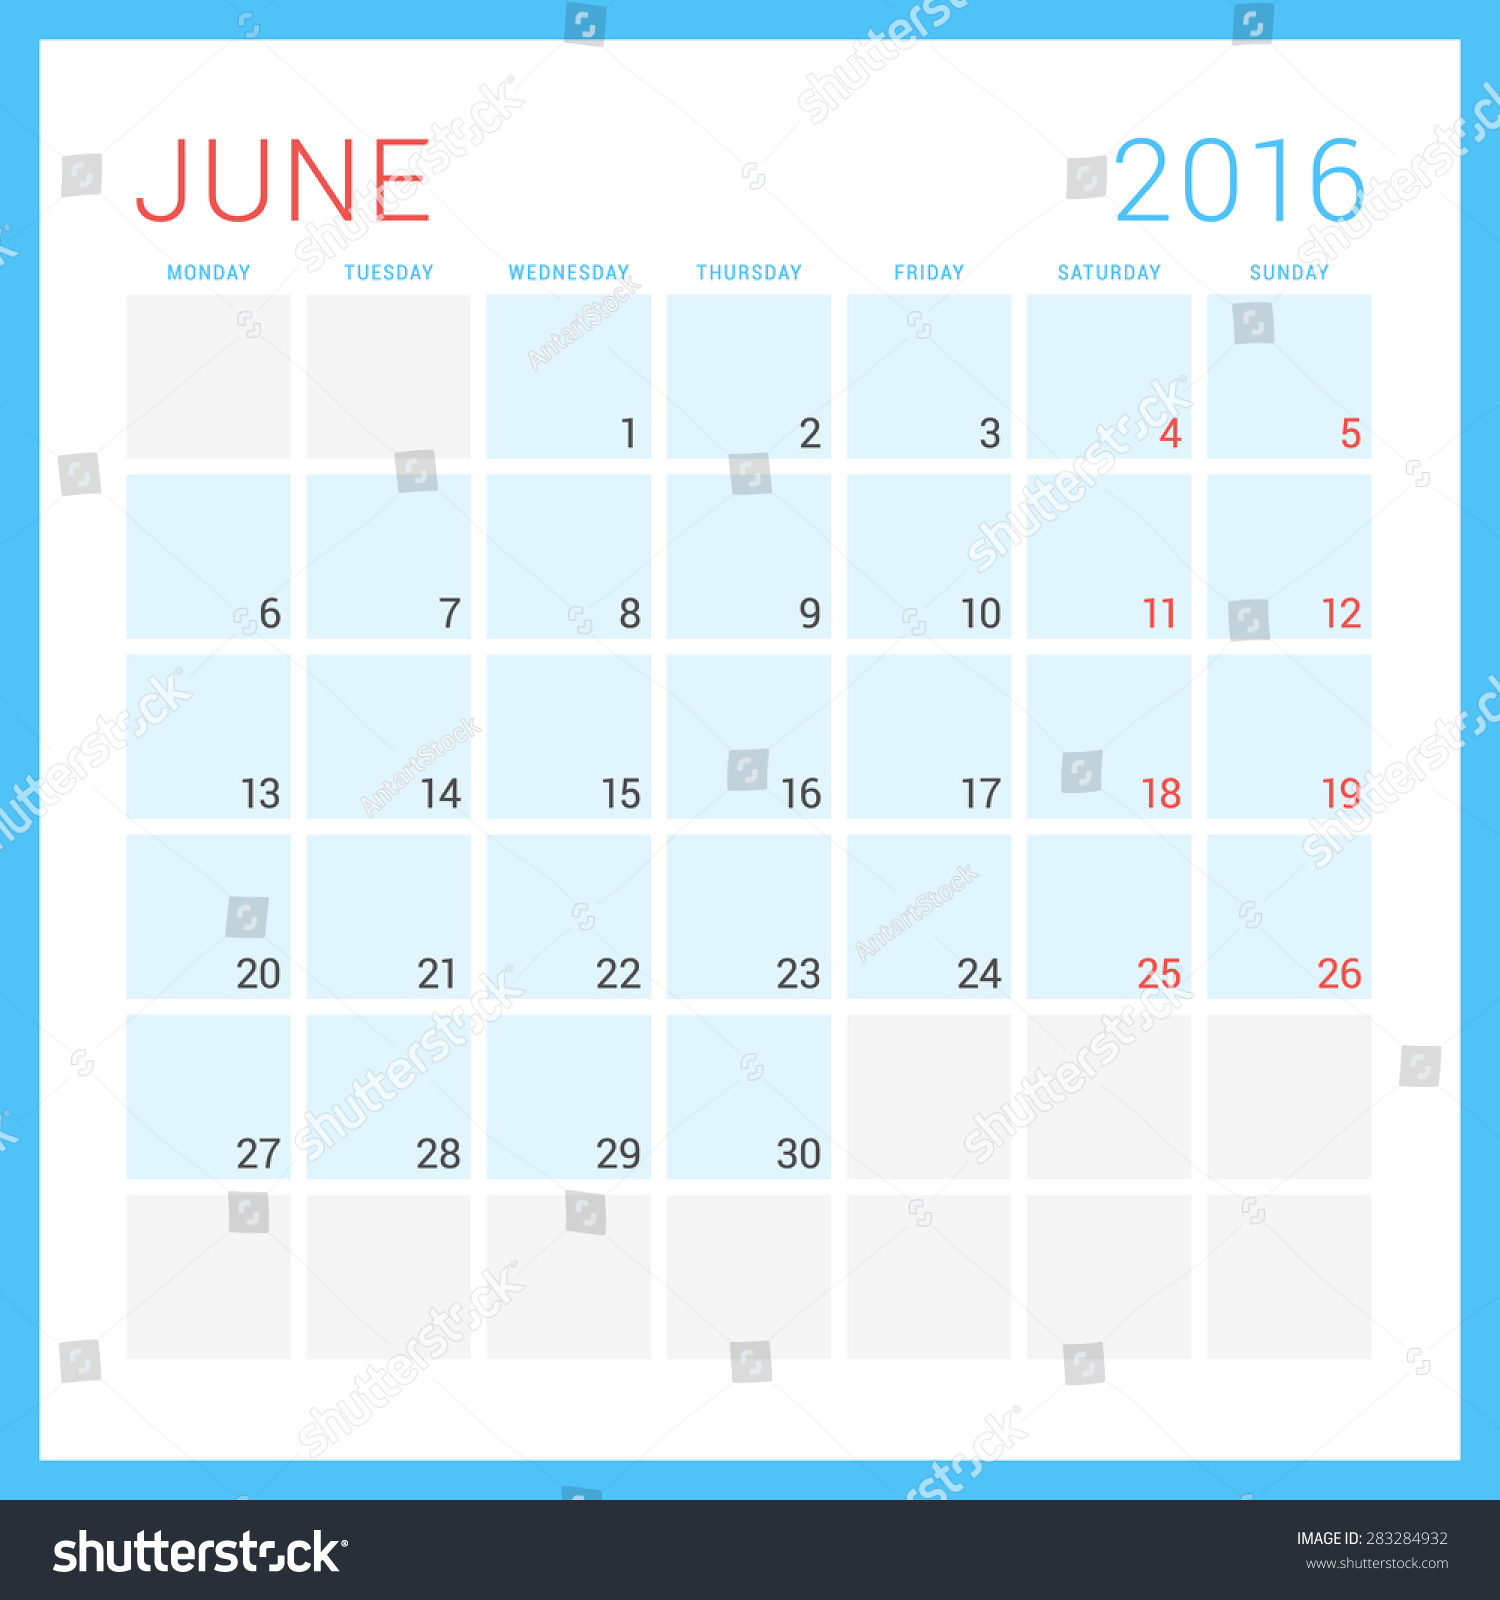 June Calendar Vector : Calendar vector flat design template stock